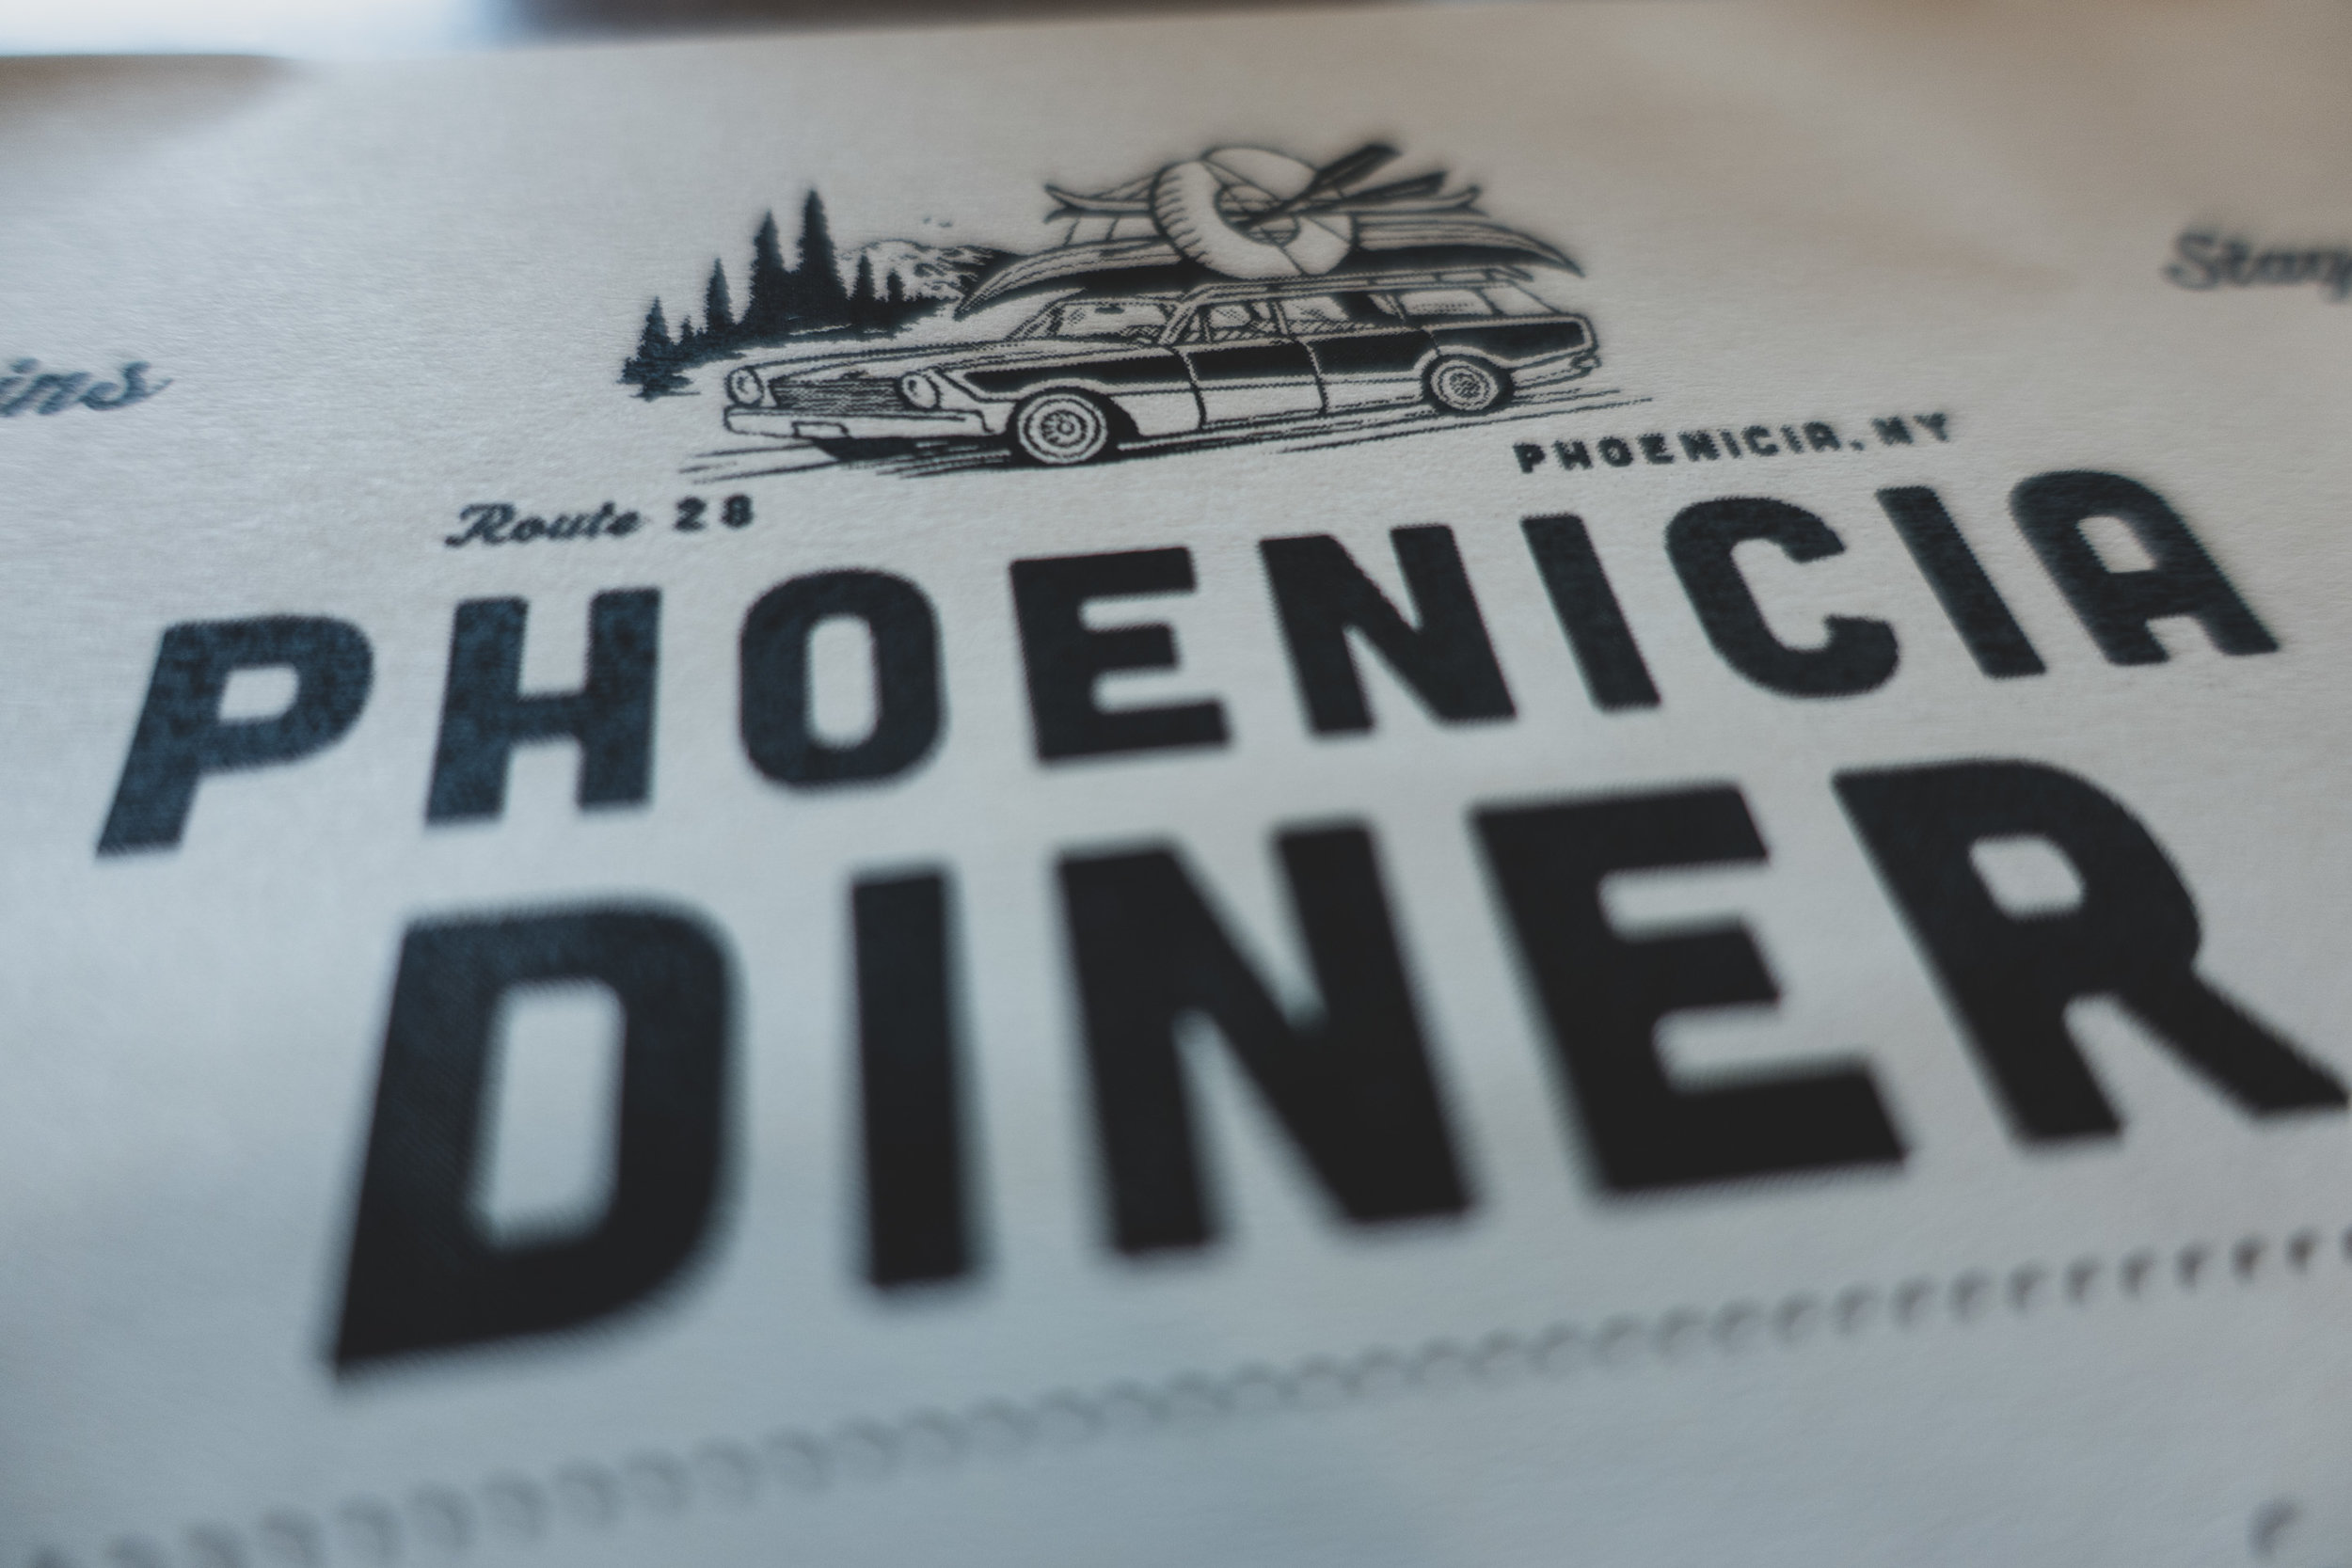 Phoenicia Experience